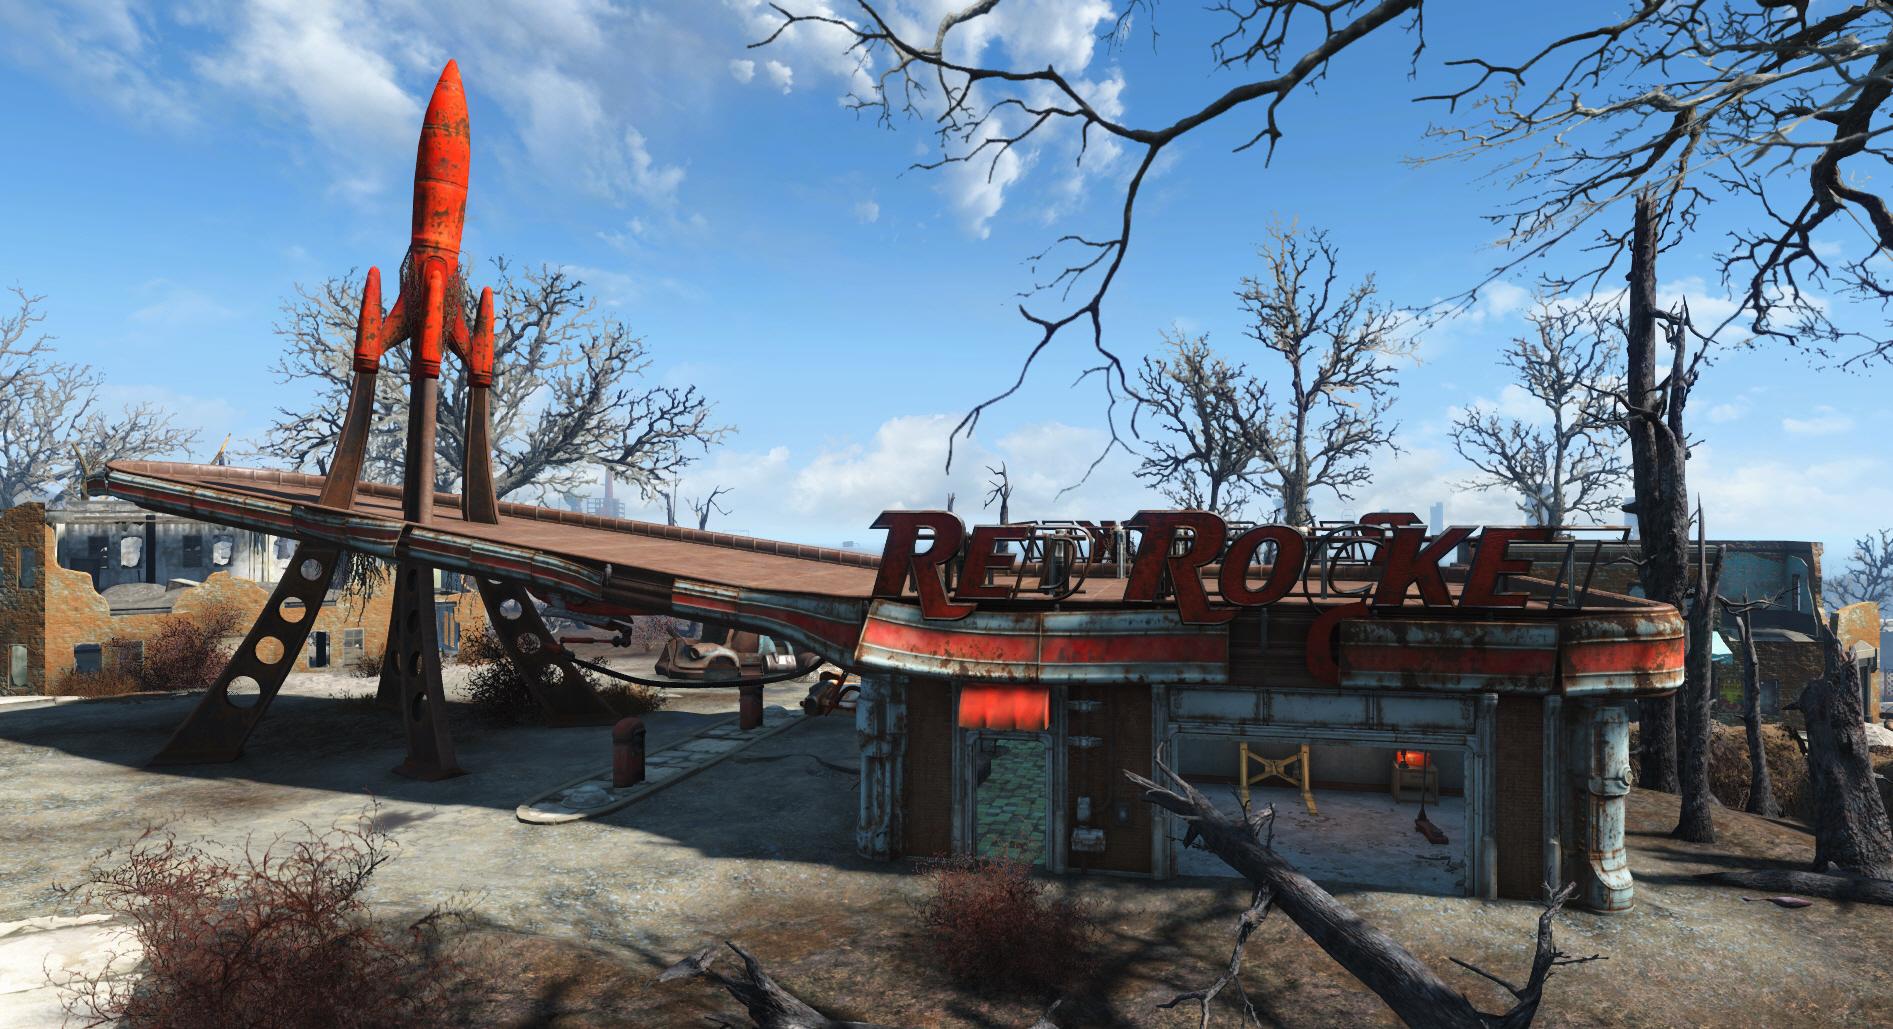 FortHagenFillingStation-Fallout4.jpg